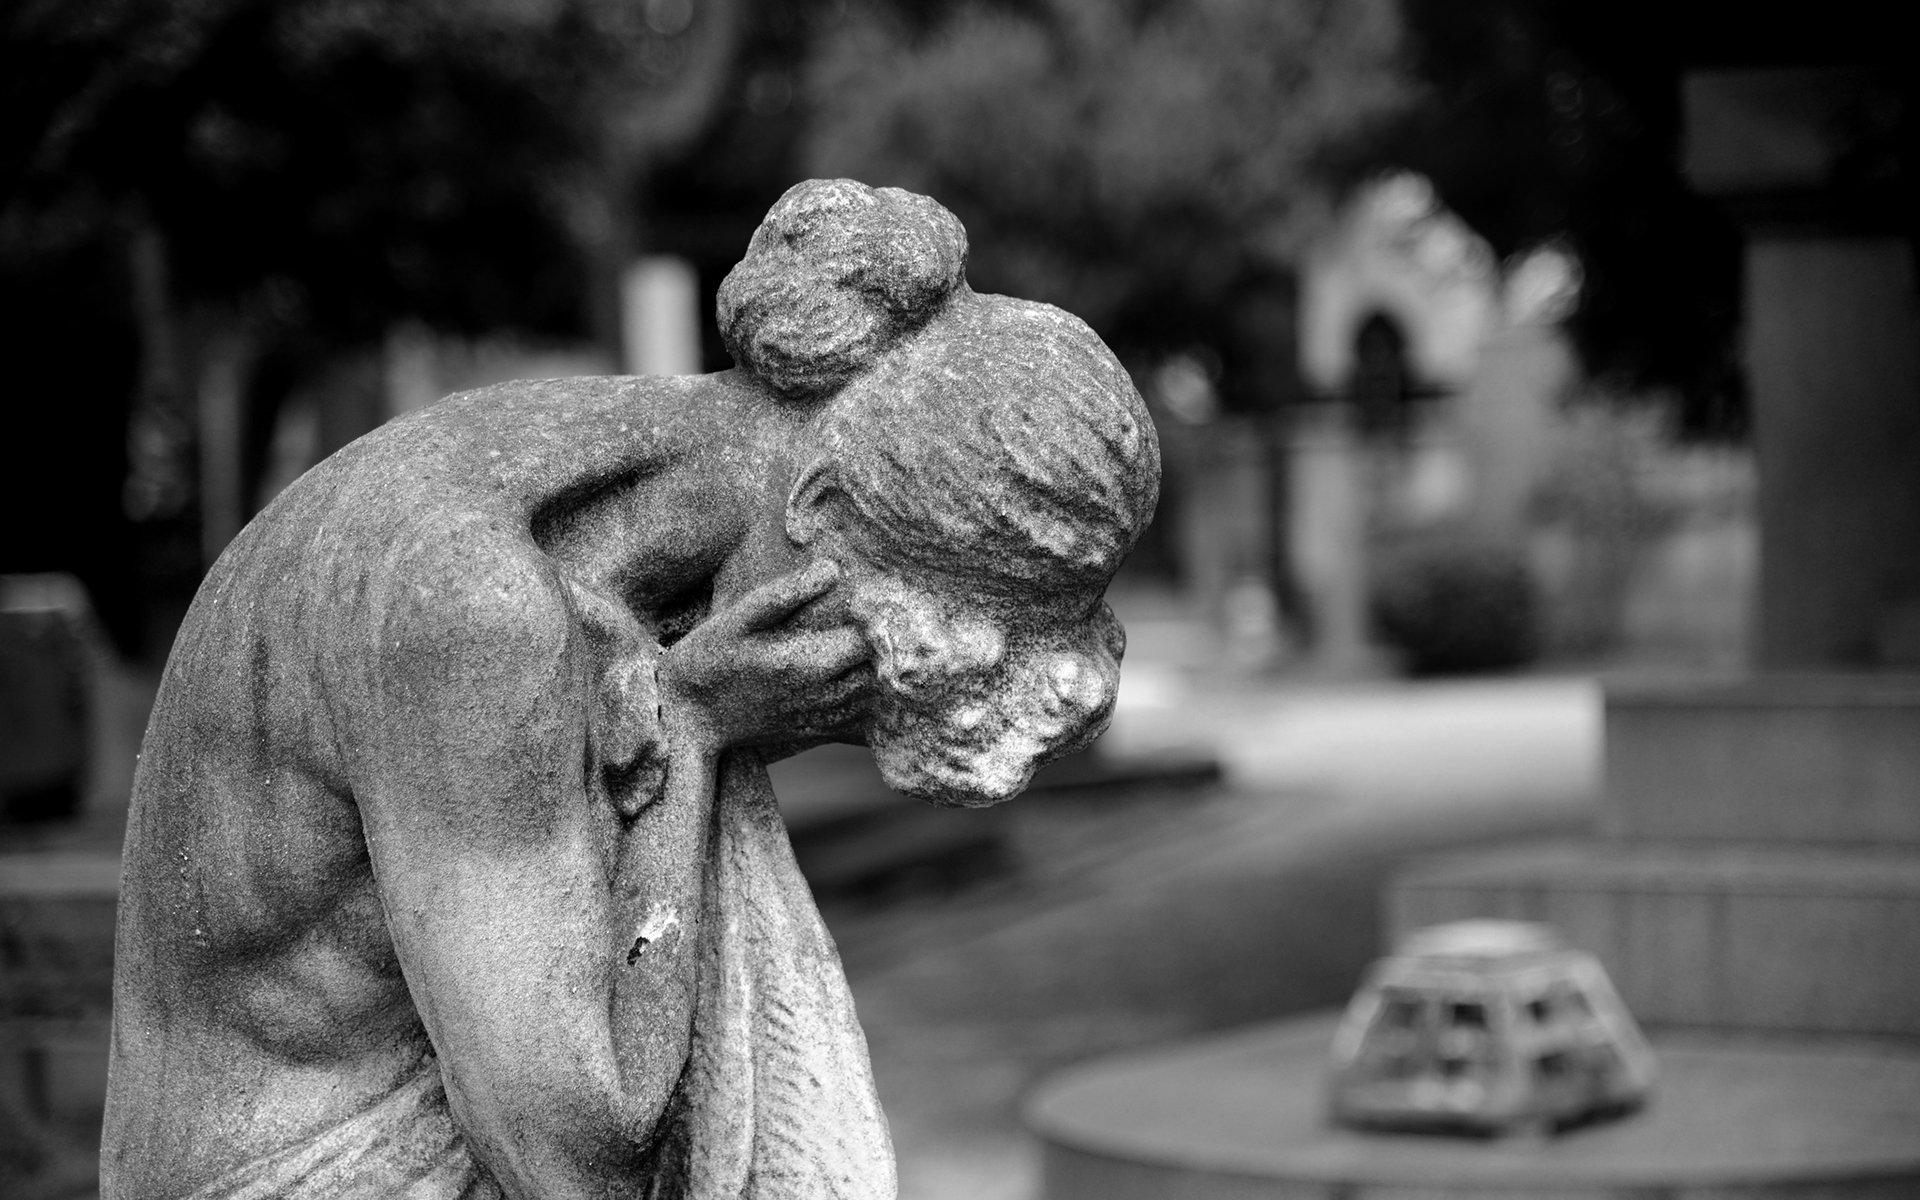 Statue Cry Sad B W mood cemetery wallpaper 1920x1200 133068 1920x1200